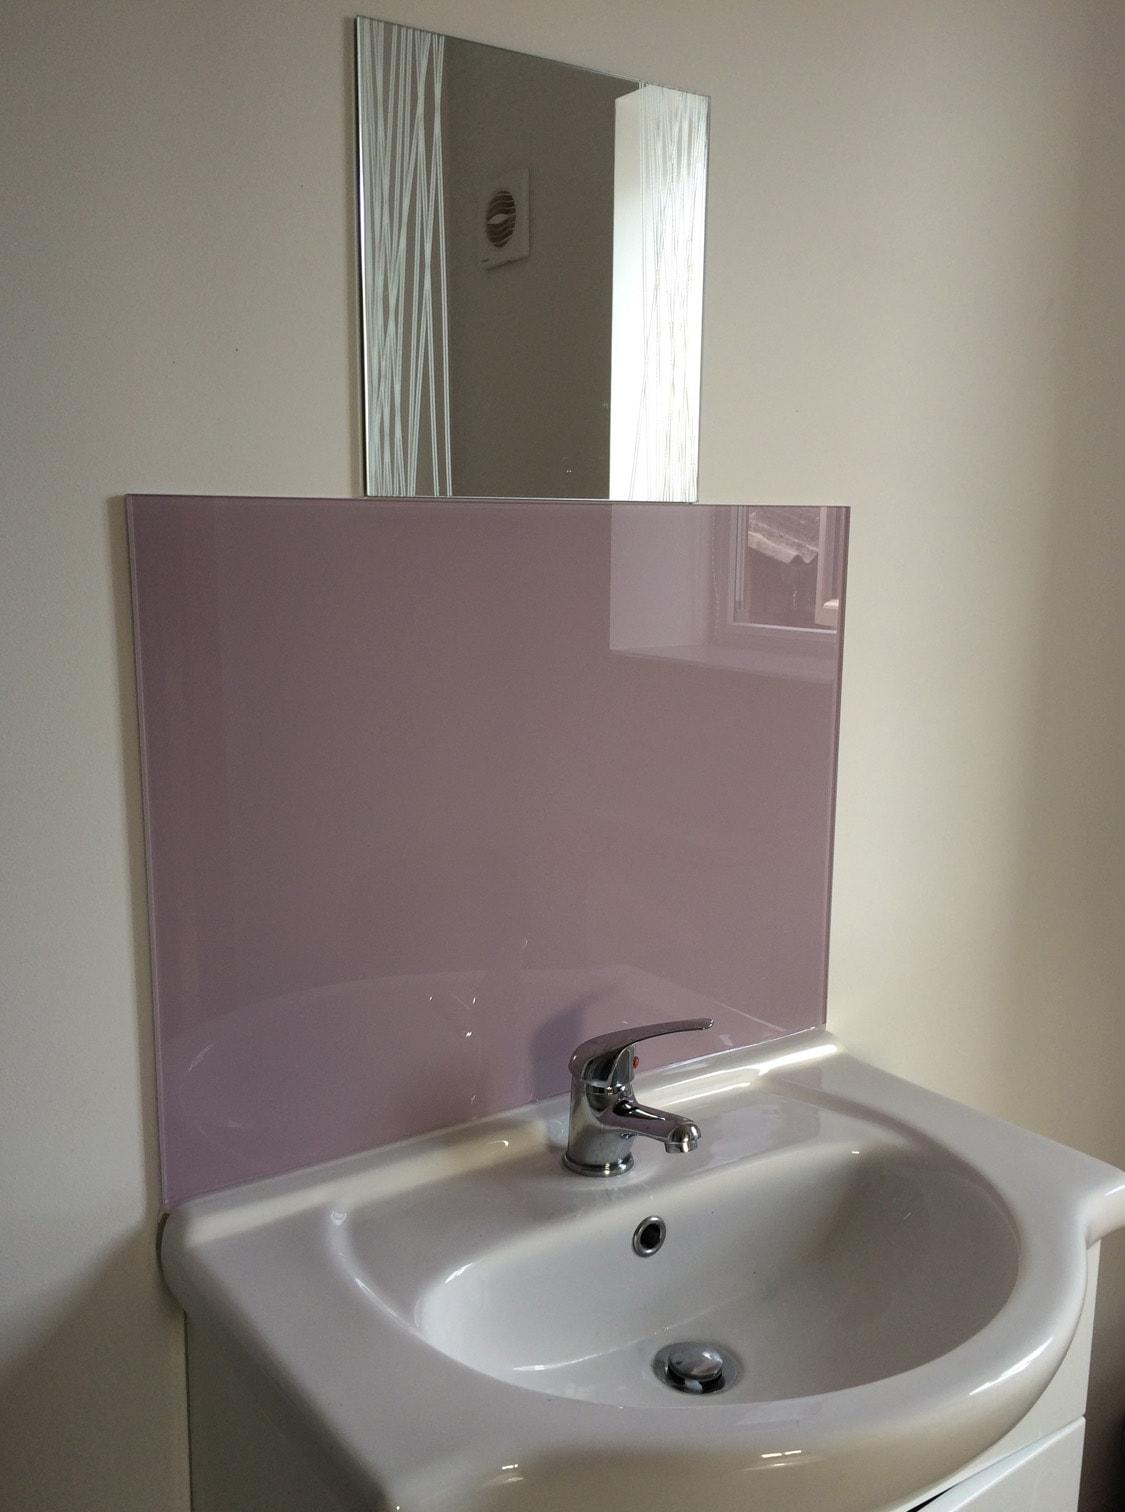 Bathroom Design Ideas Glass Splashback ~ Toughened bathroom splashback and window sill